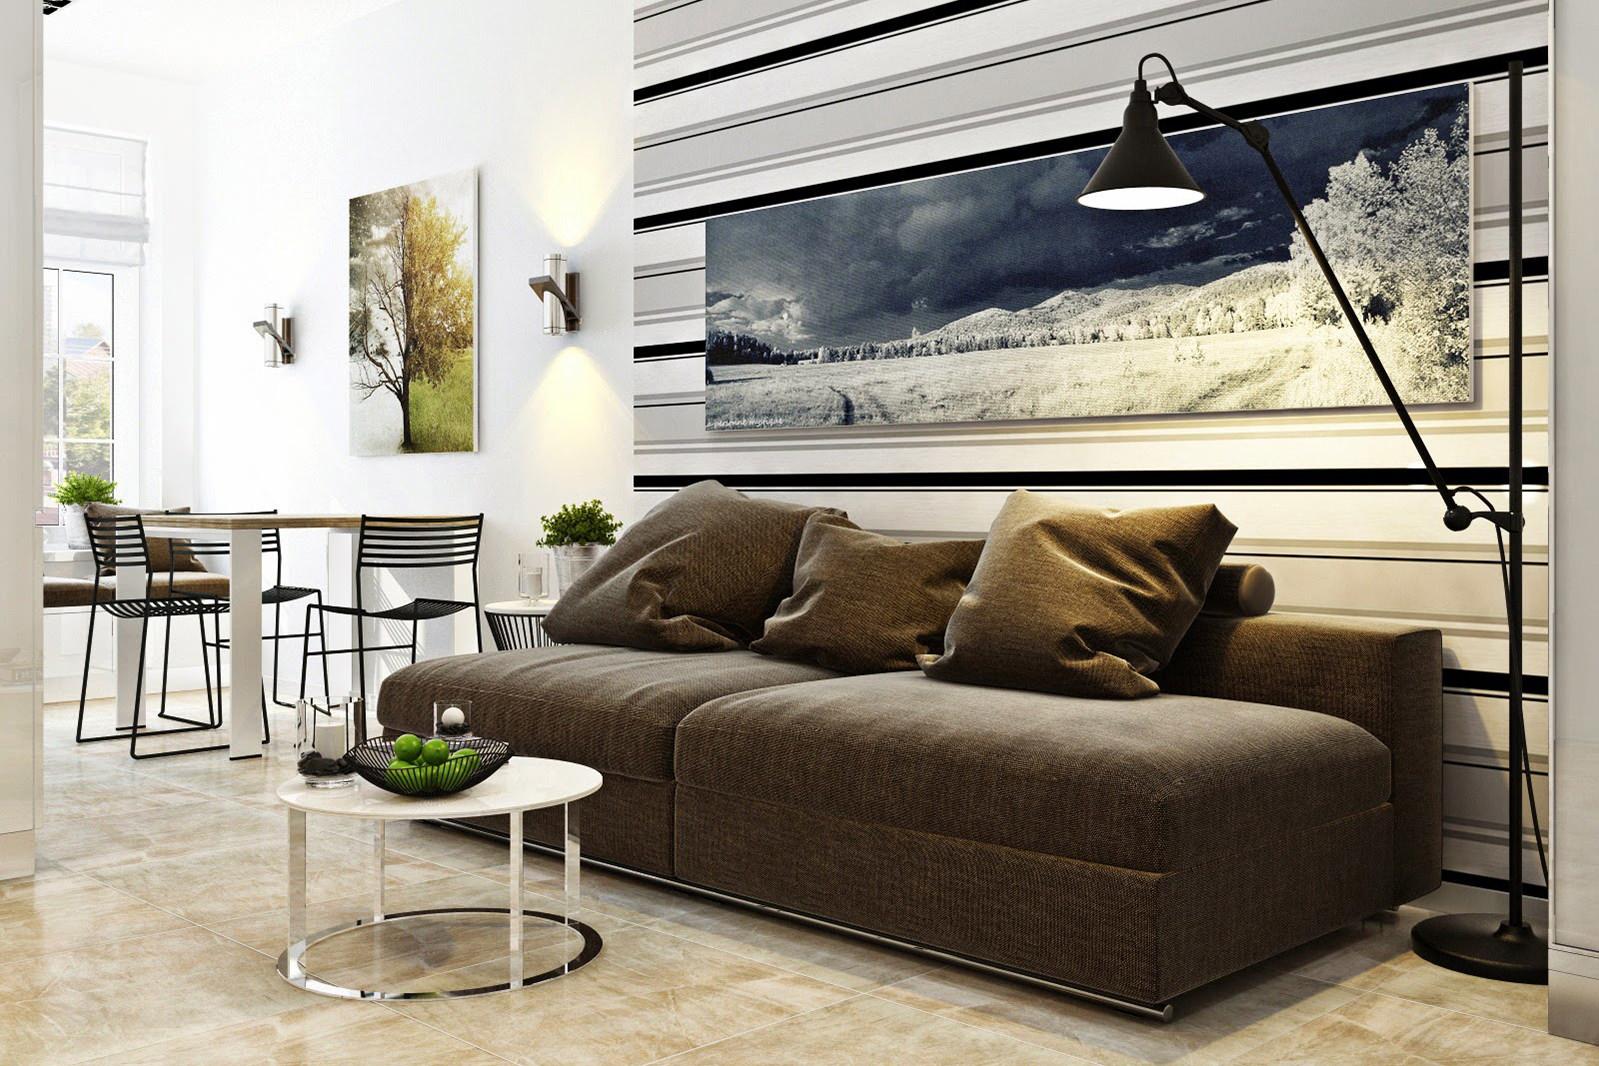 Малогабаритный серый диван